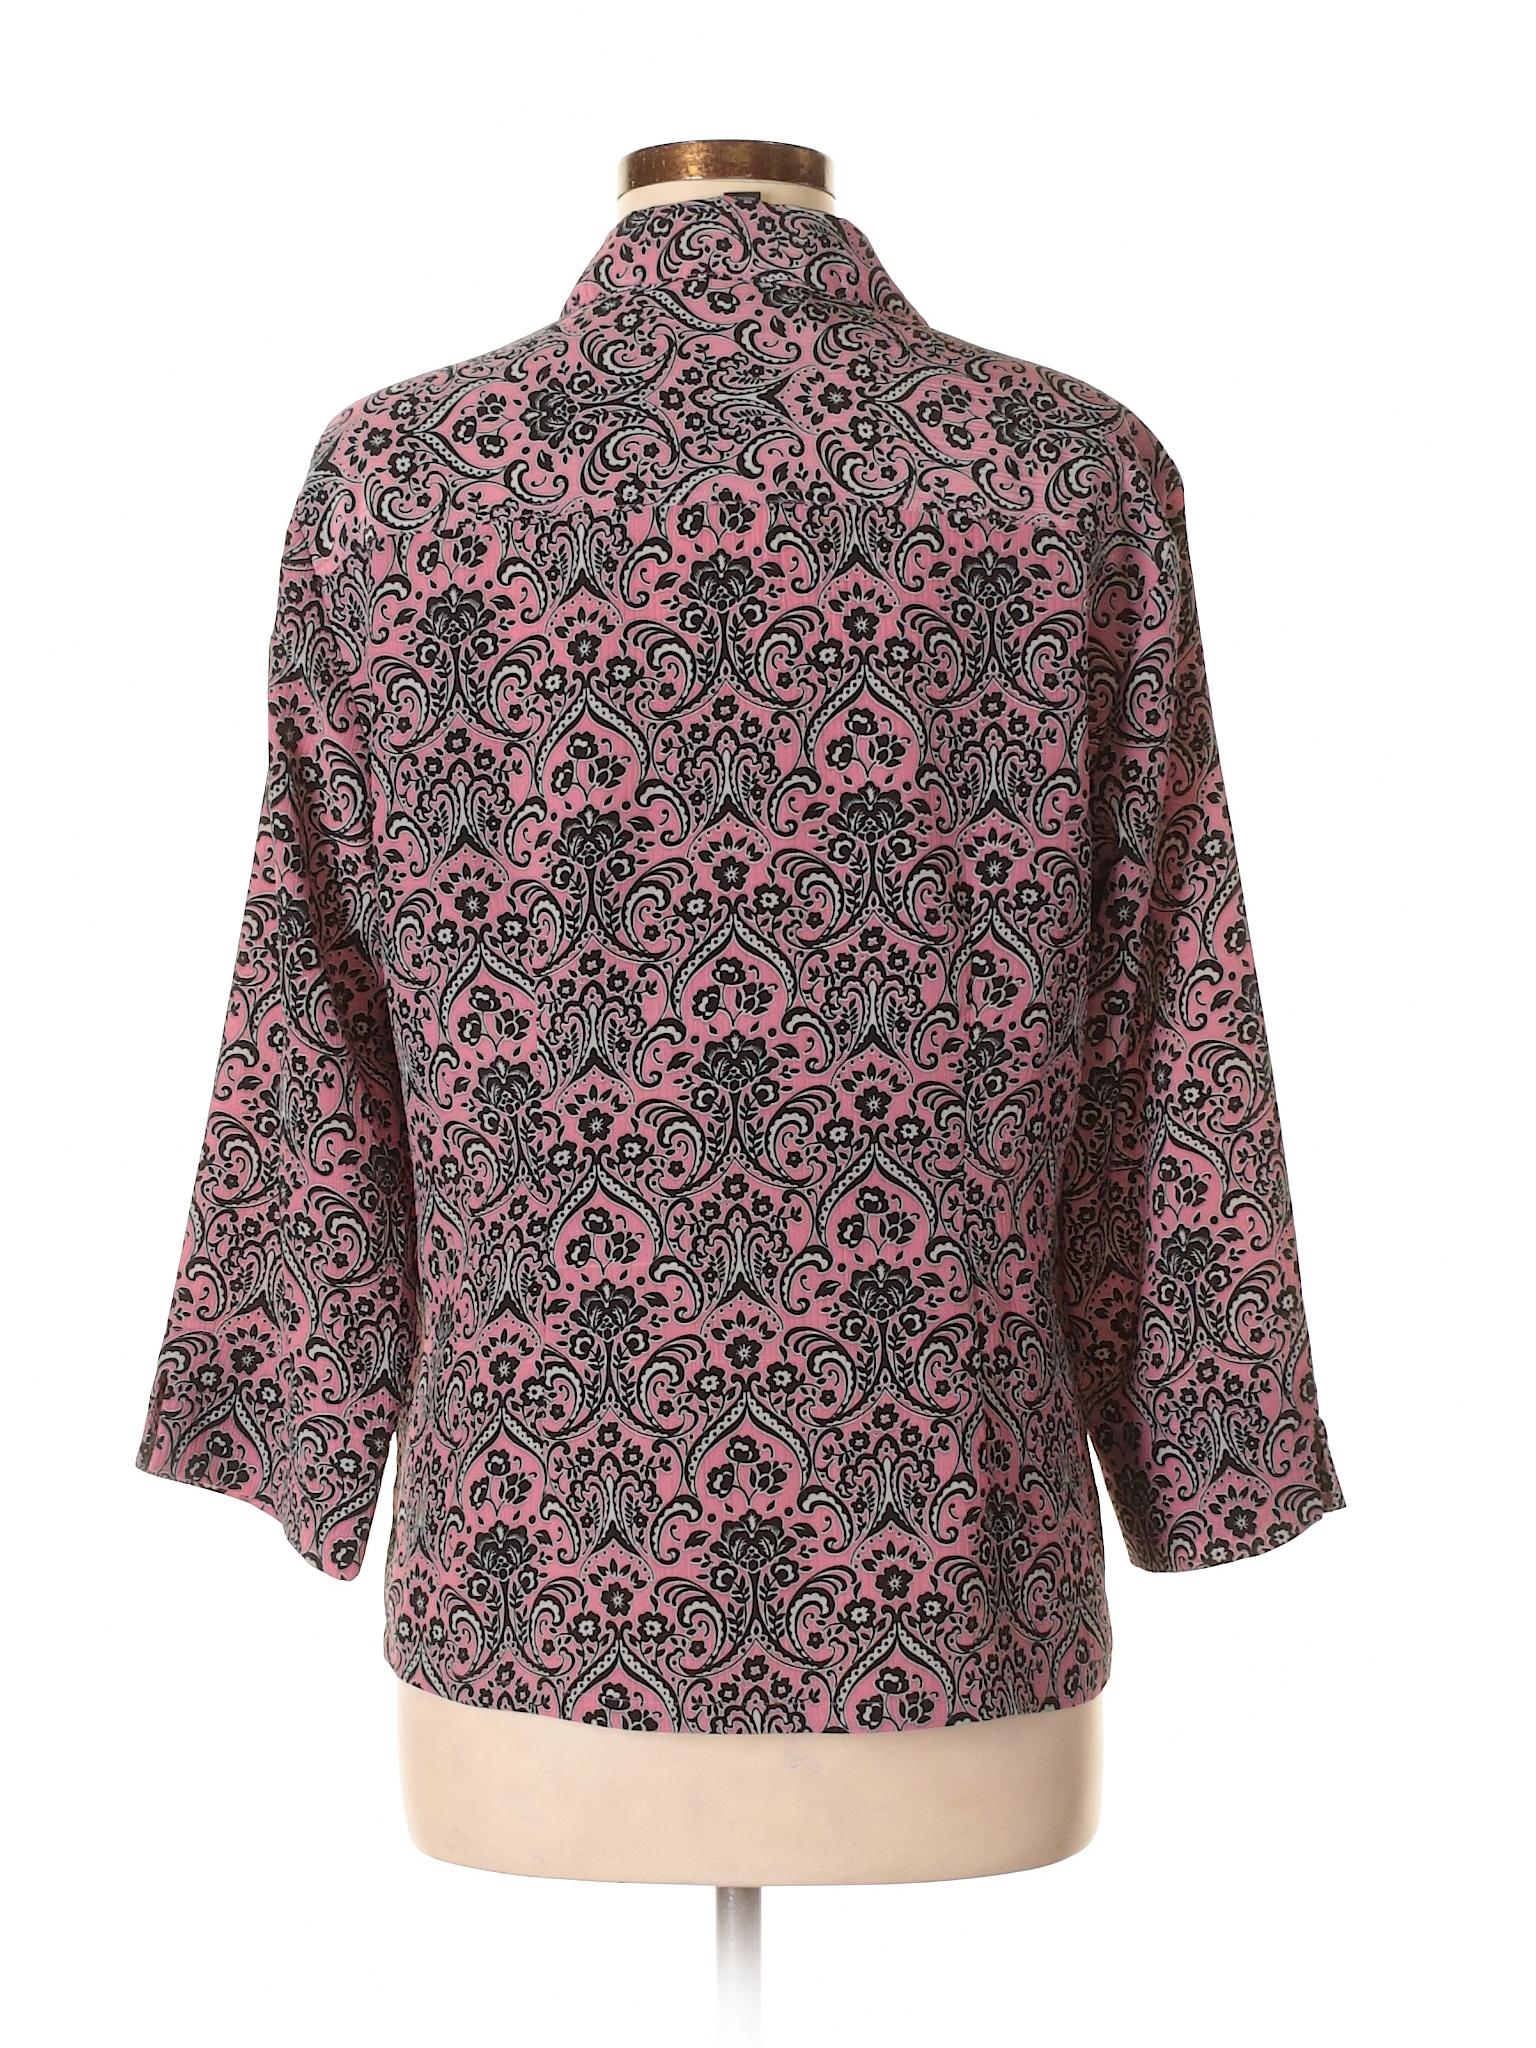 aefb06b7cc5069 DonnKenny Classics 100% Polyester Print Pink 3/4 Sleeve Blouse Size ...